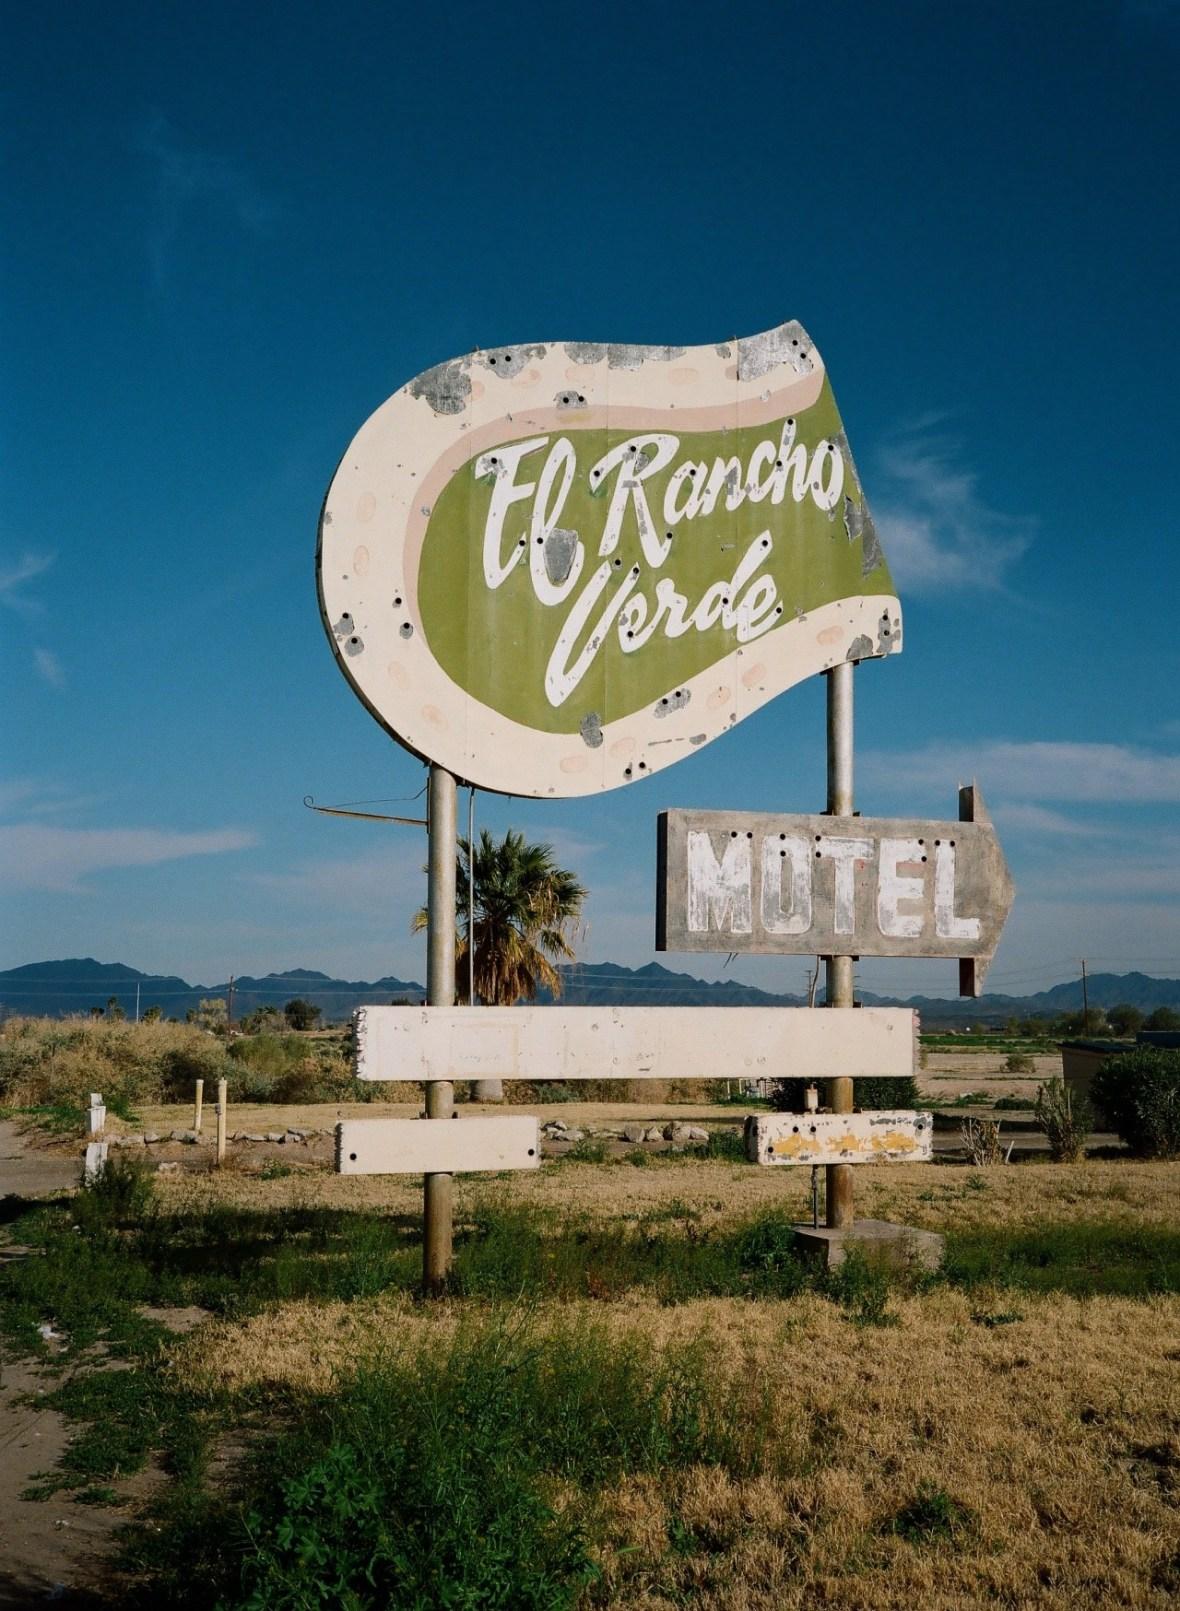 El Rancho Verde Motel - Blythe, California U.S.A. - February 26, 2013